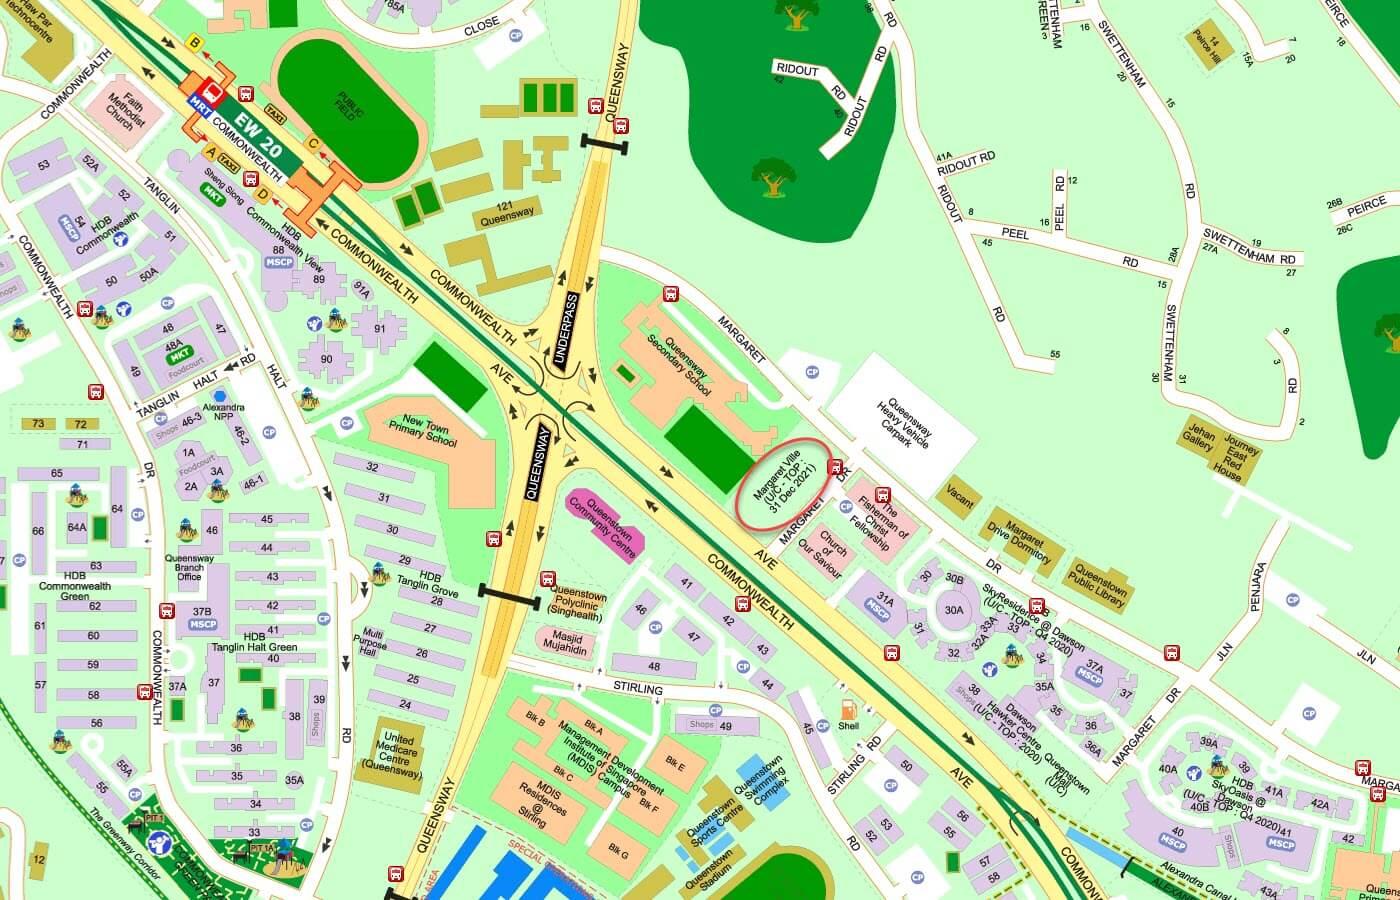 Margaret Ville Condo Street Directory Map